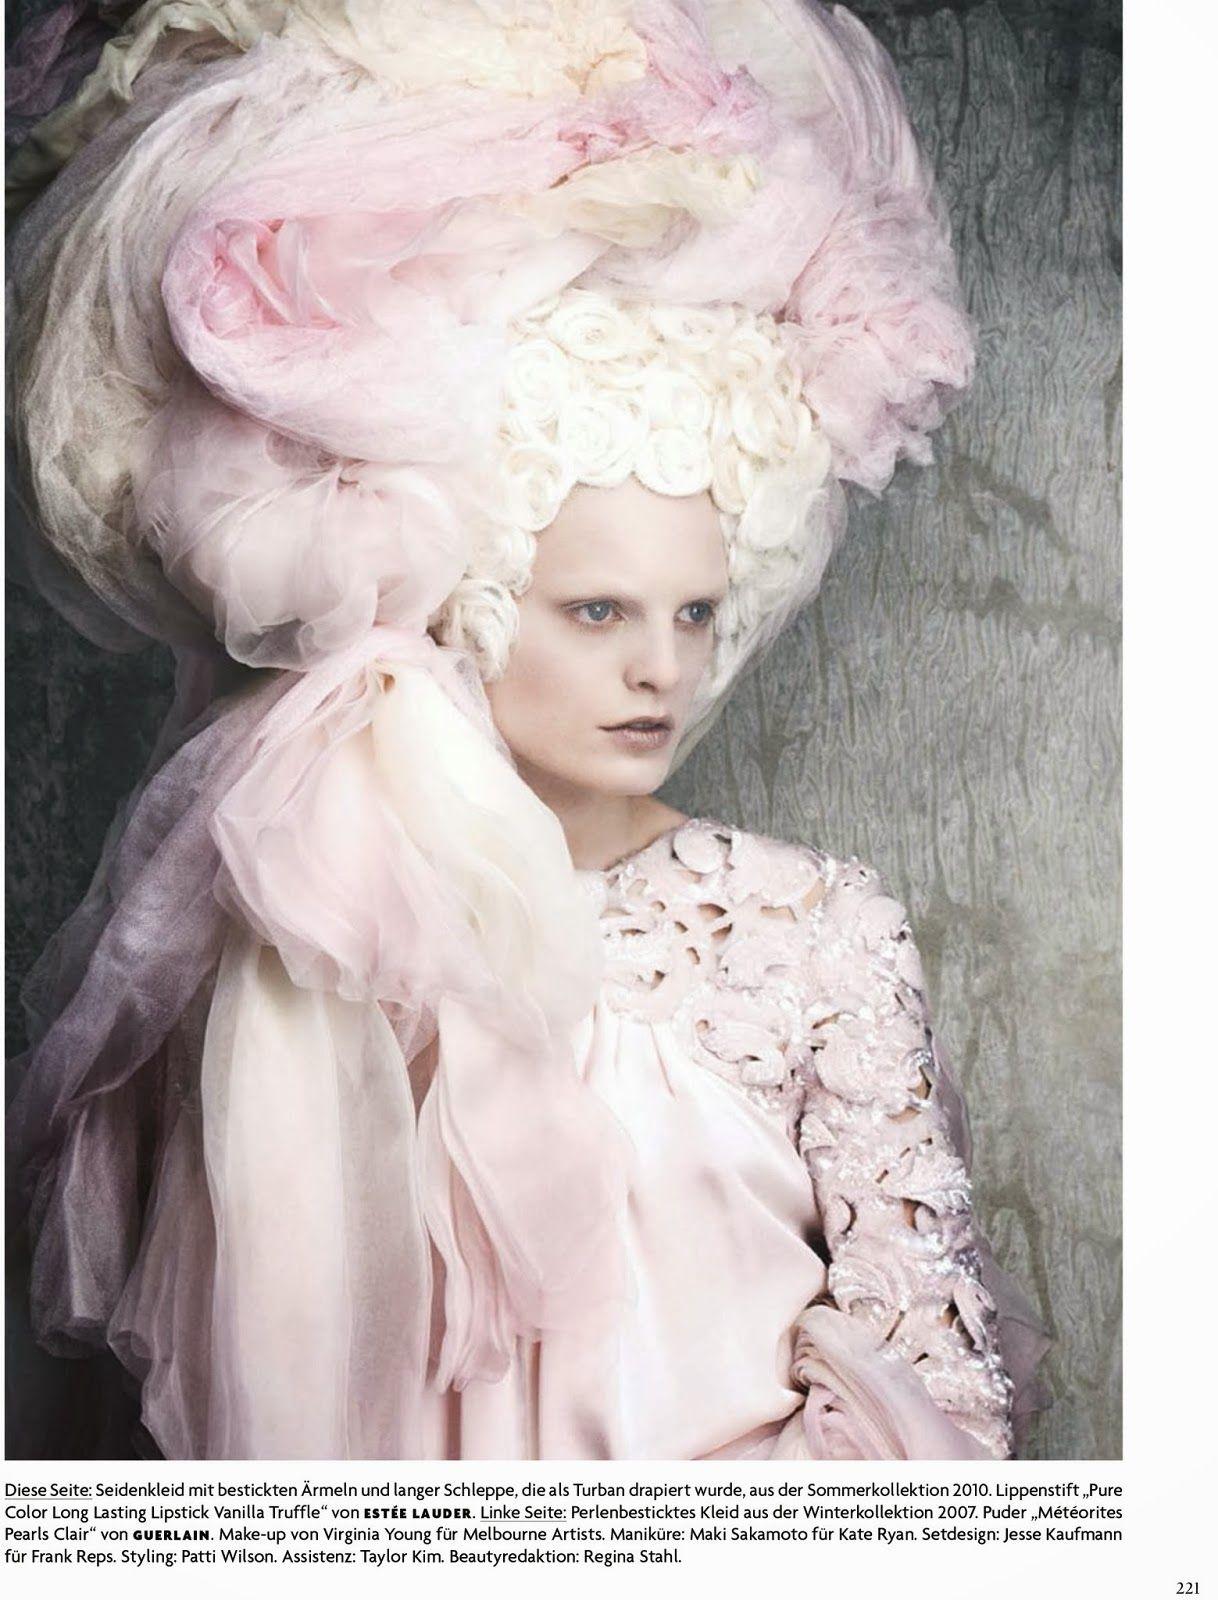 Luigi + Iango for Vogue Germany, April 2014, Opulenz À La Marie Antoinette & Kopfarbeit